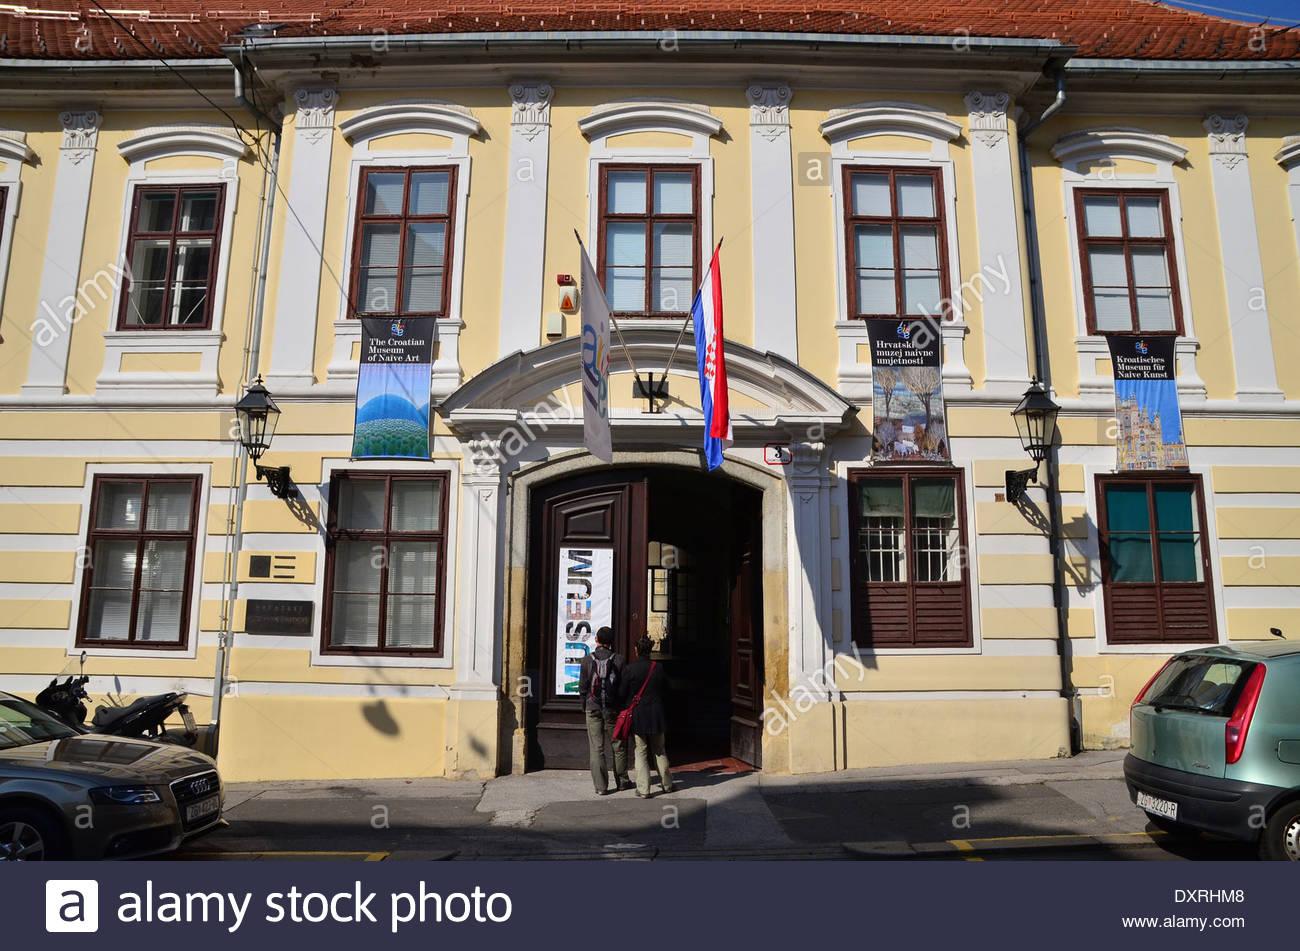 Croatian Museum of Naive Art, upper town(Gradec), Zagreb, Croatia - Stock Image